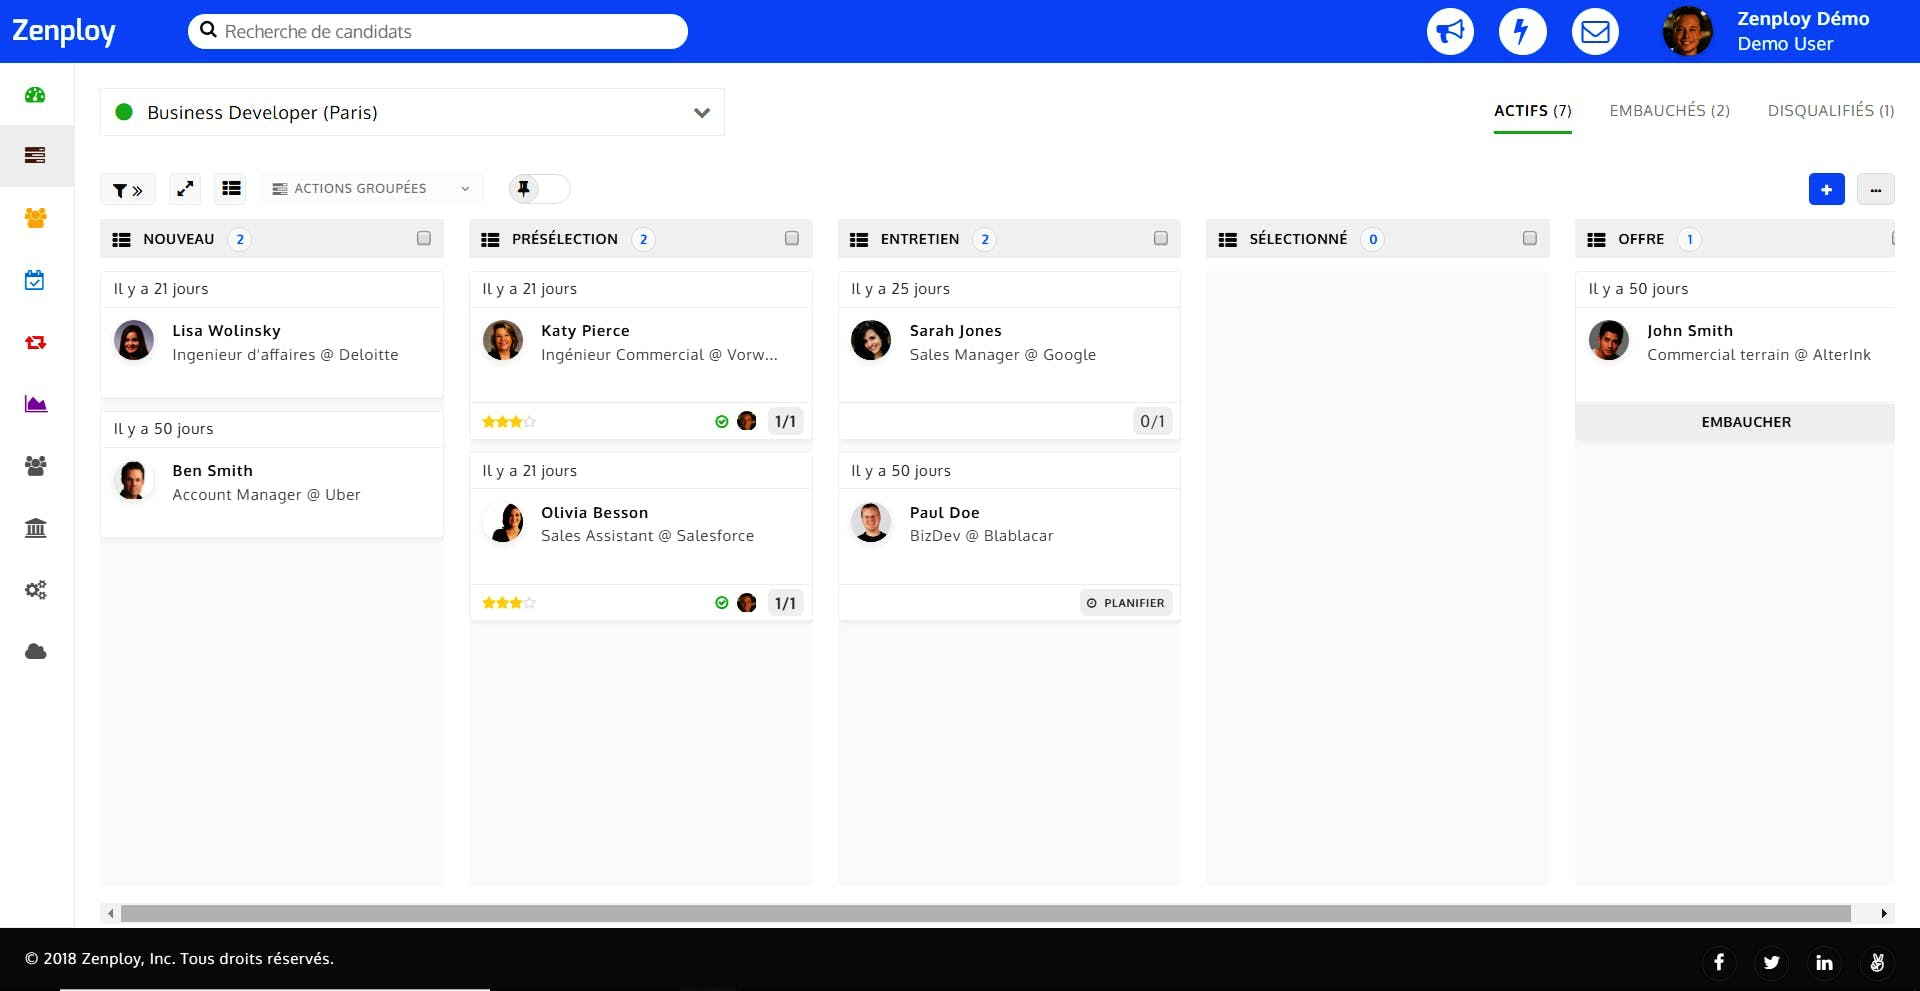 interface logiciel SIRH Zenploy